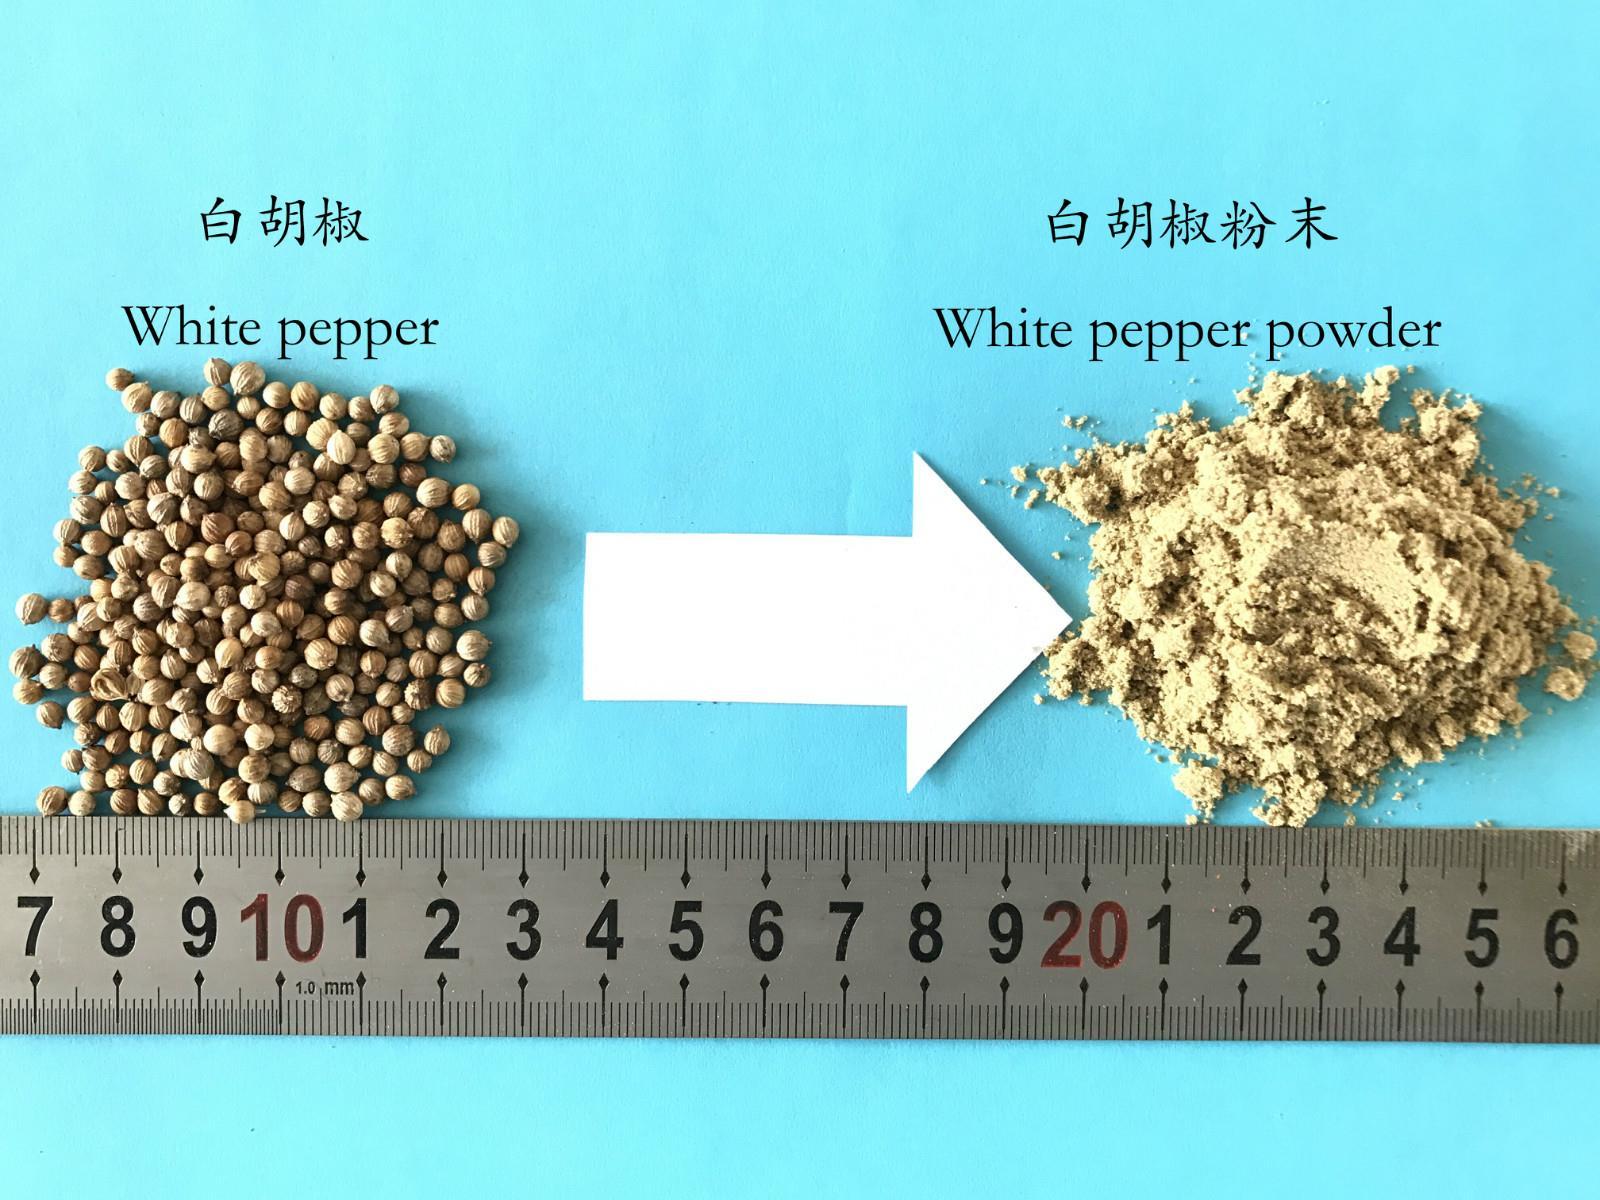 White pepper powder milling machine (3)_meitu_20.jpg